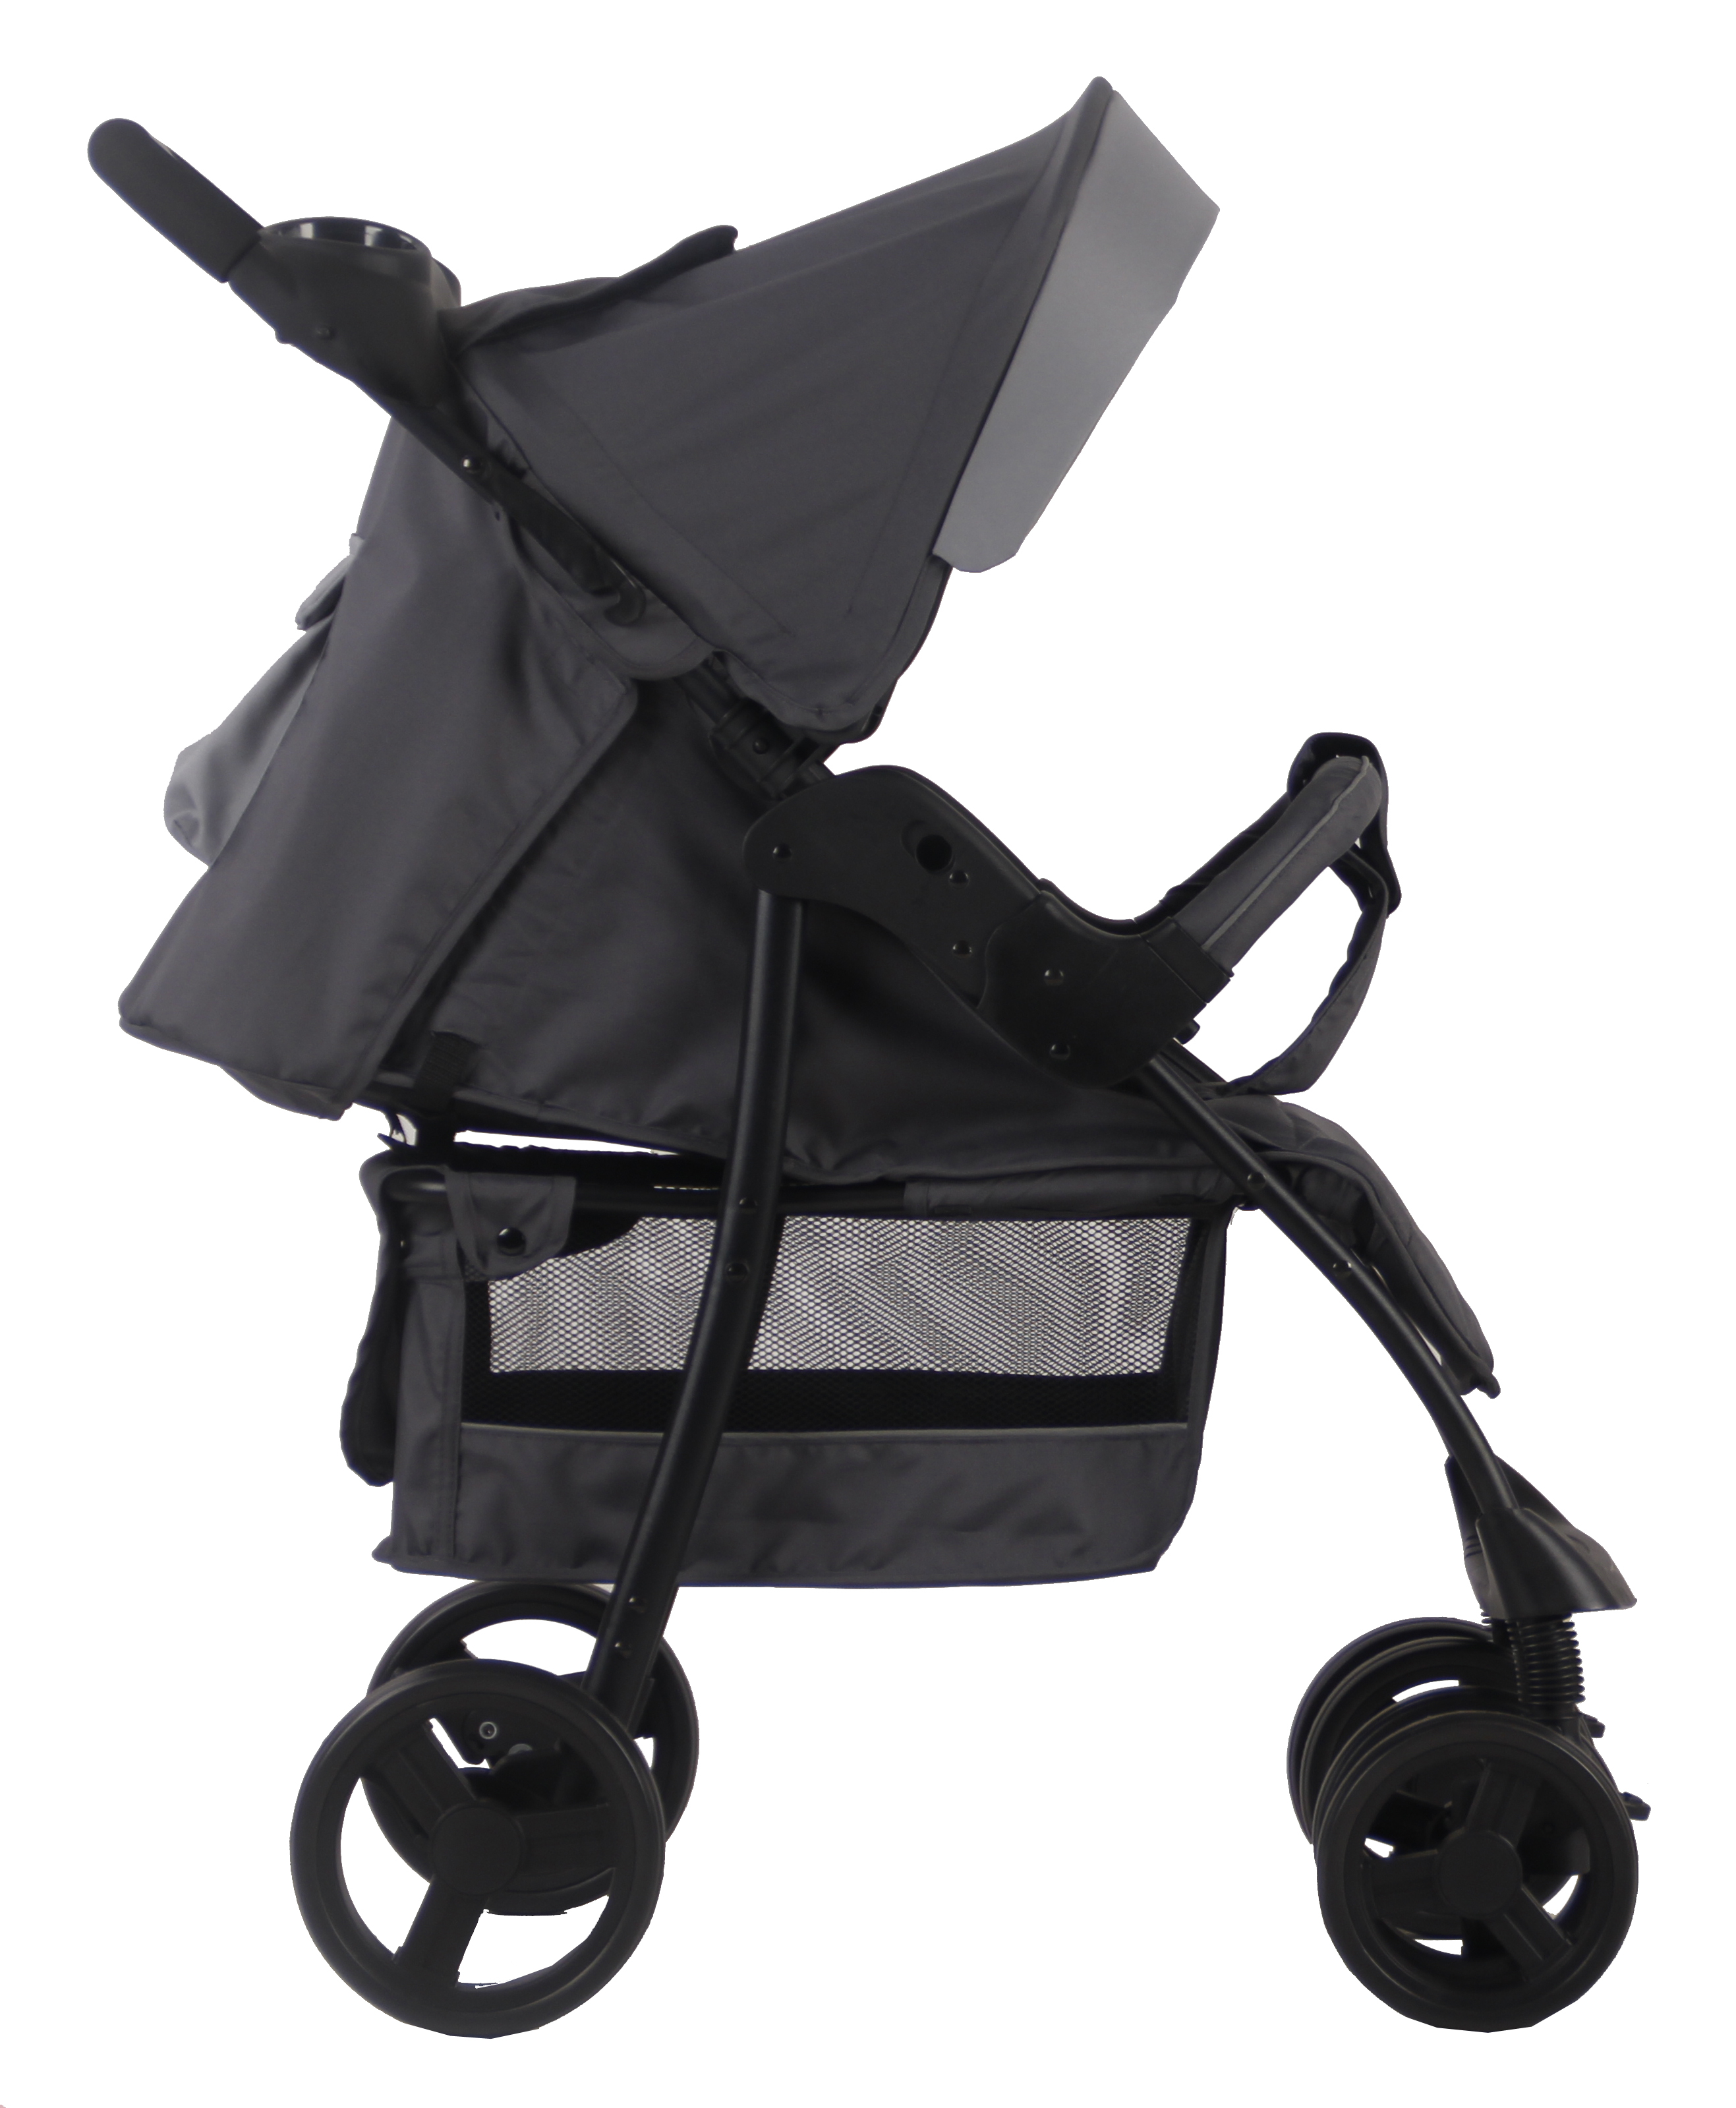 Прогулочная коляска Parusok Jogger Pro серый